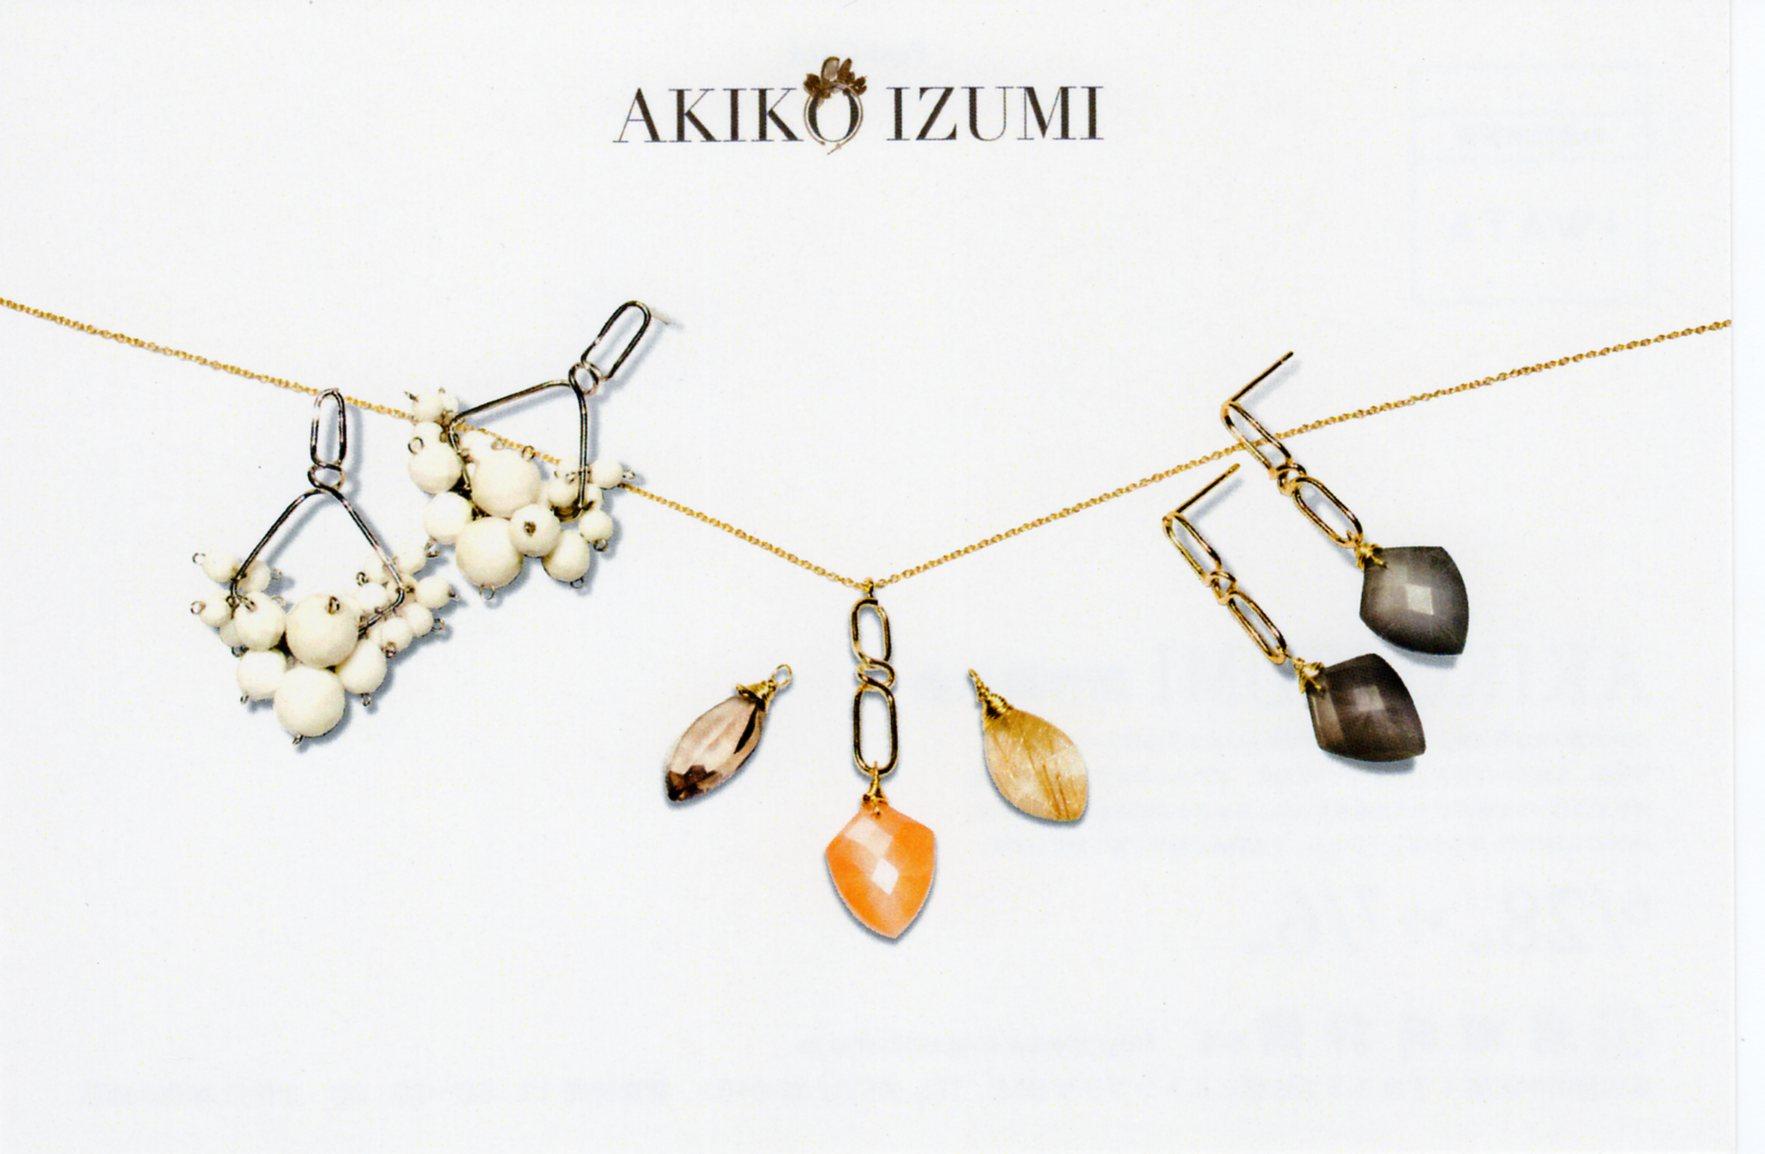 AKIKO IZUMI 新作展示会_b0189395_10315710.jpg